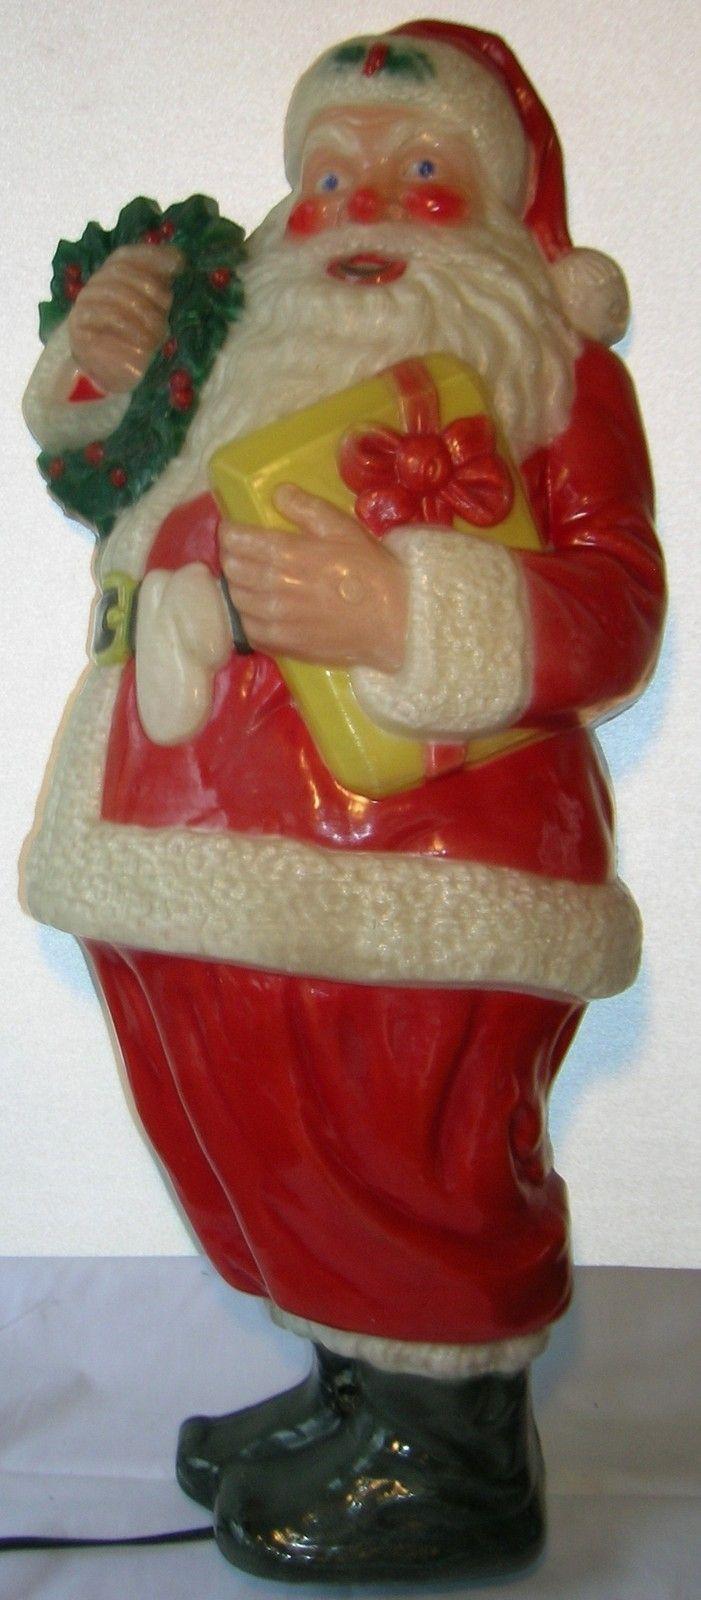 Vintage 1950s noma christmas santa claus blow mold light reverse vintage 1950s noma christmas santa claus blow mold light reverse paint aloadofball Images